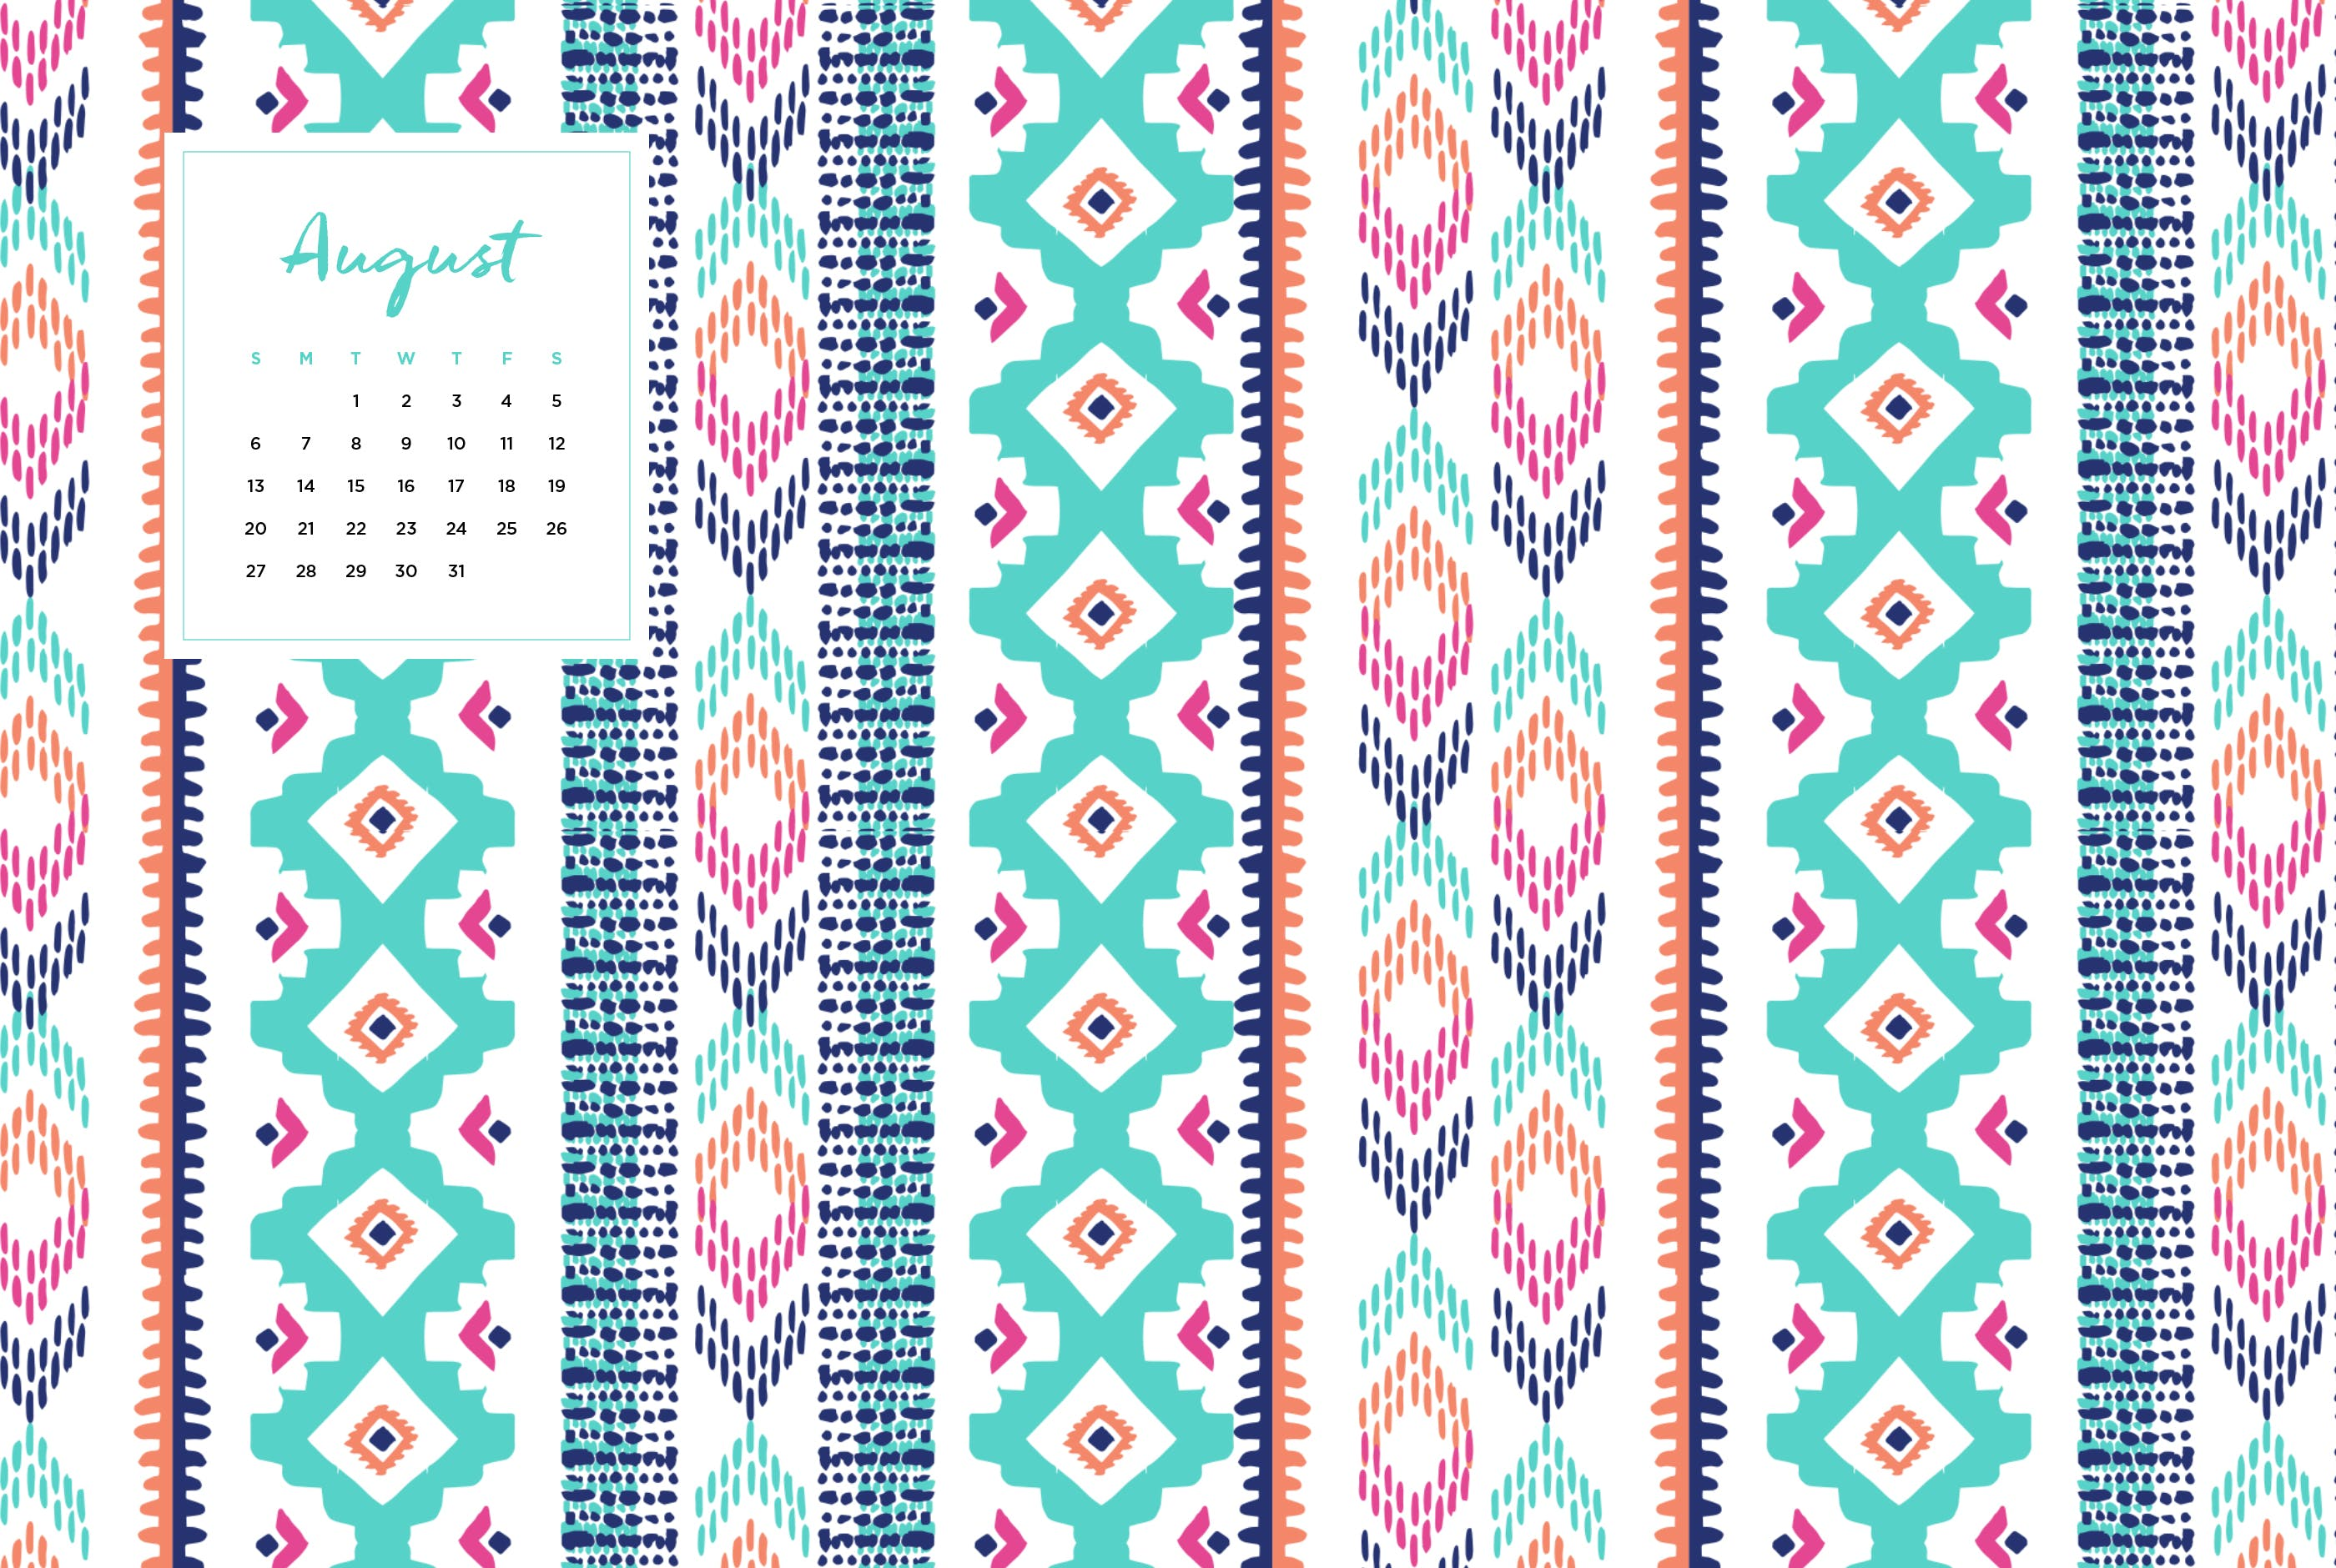 Digital Wallpapers August 2017 May Designs